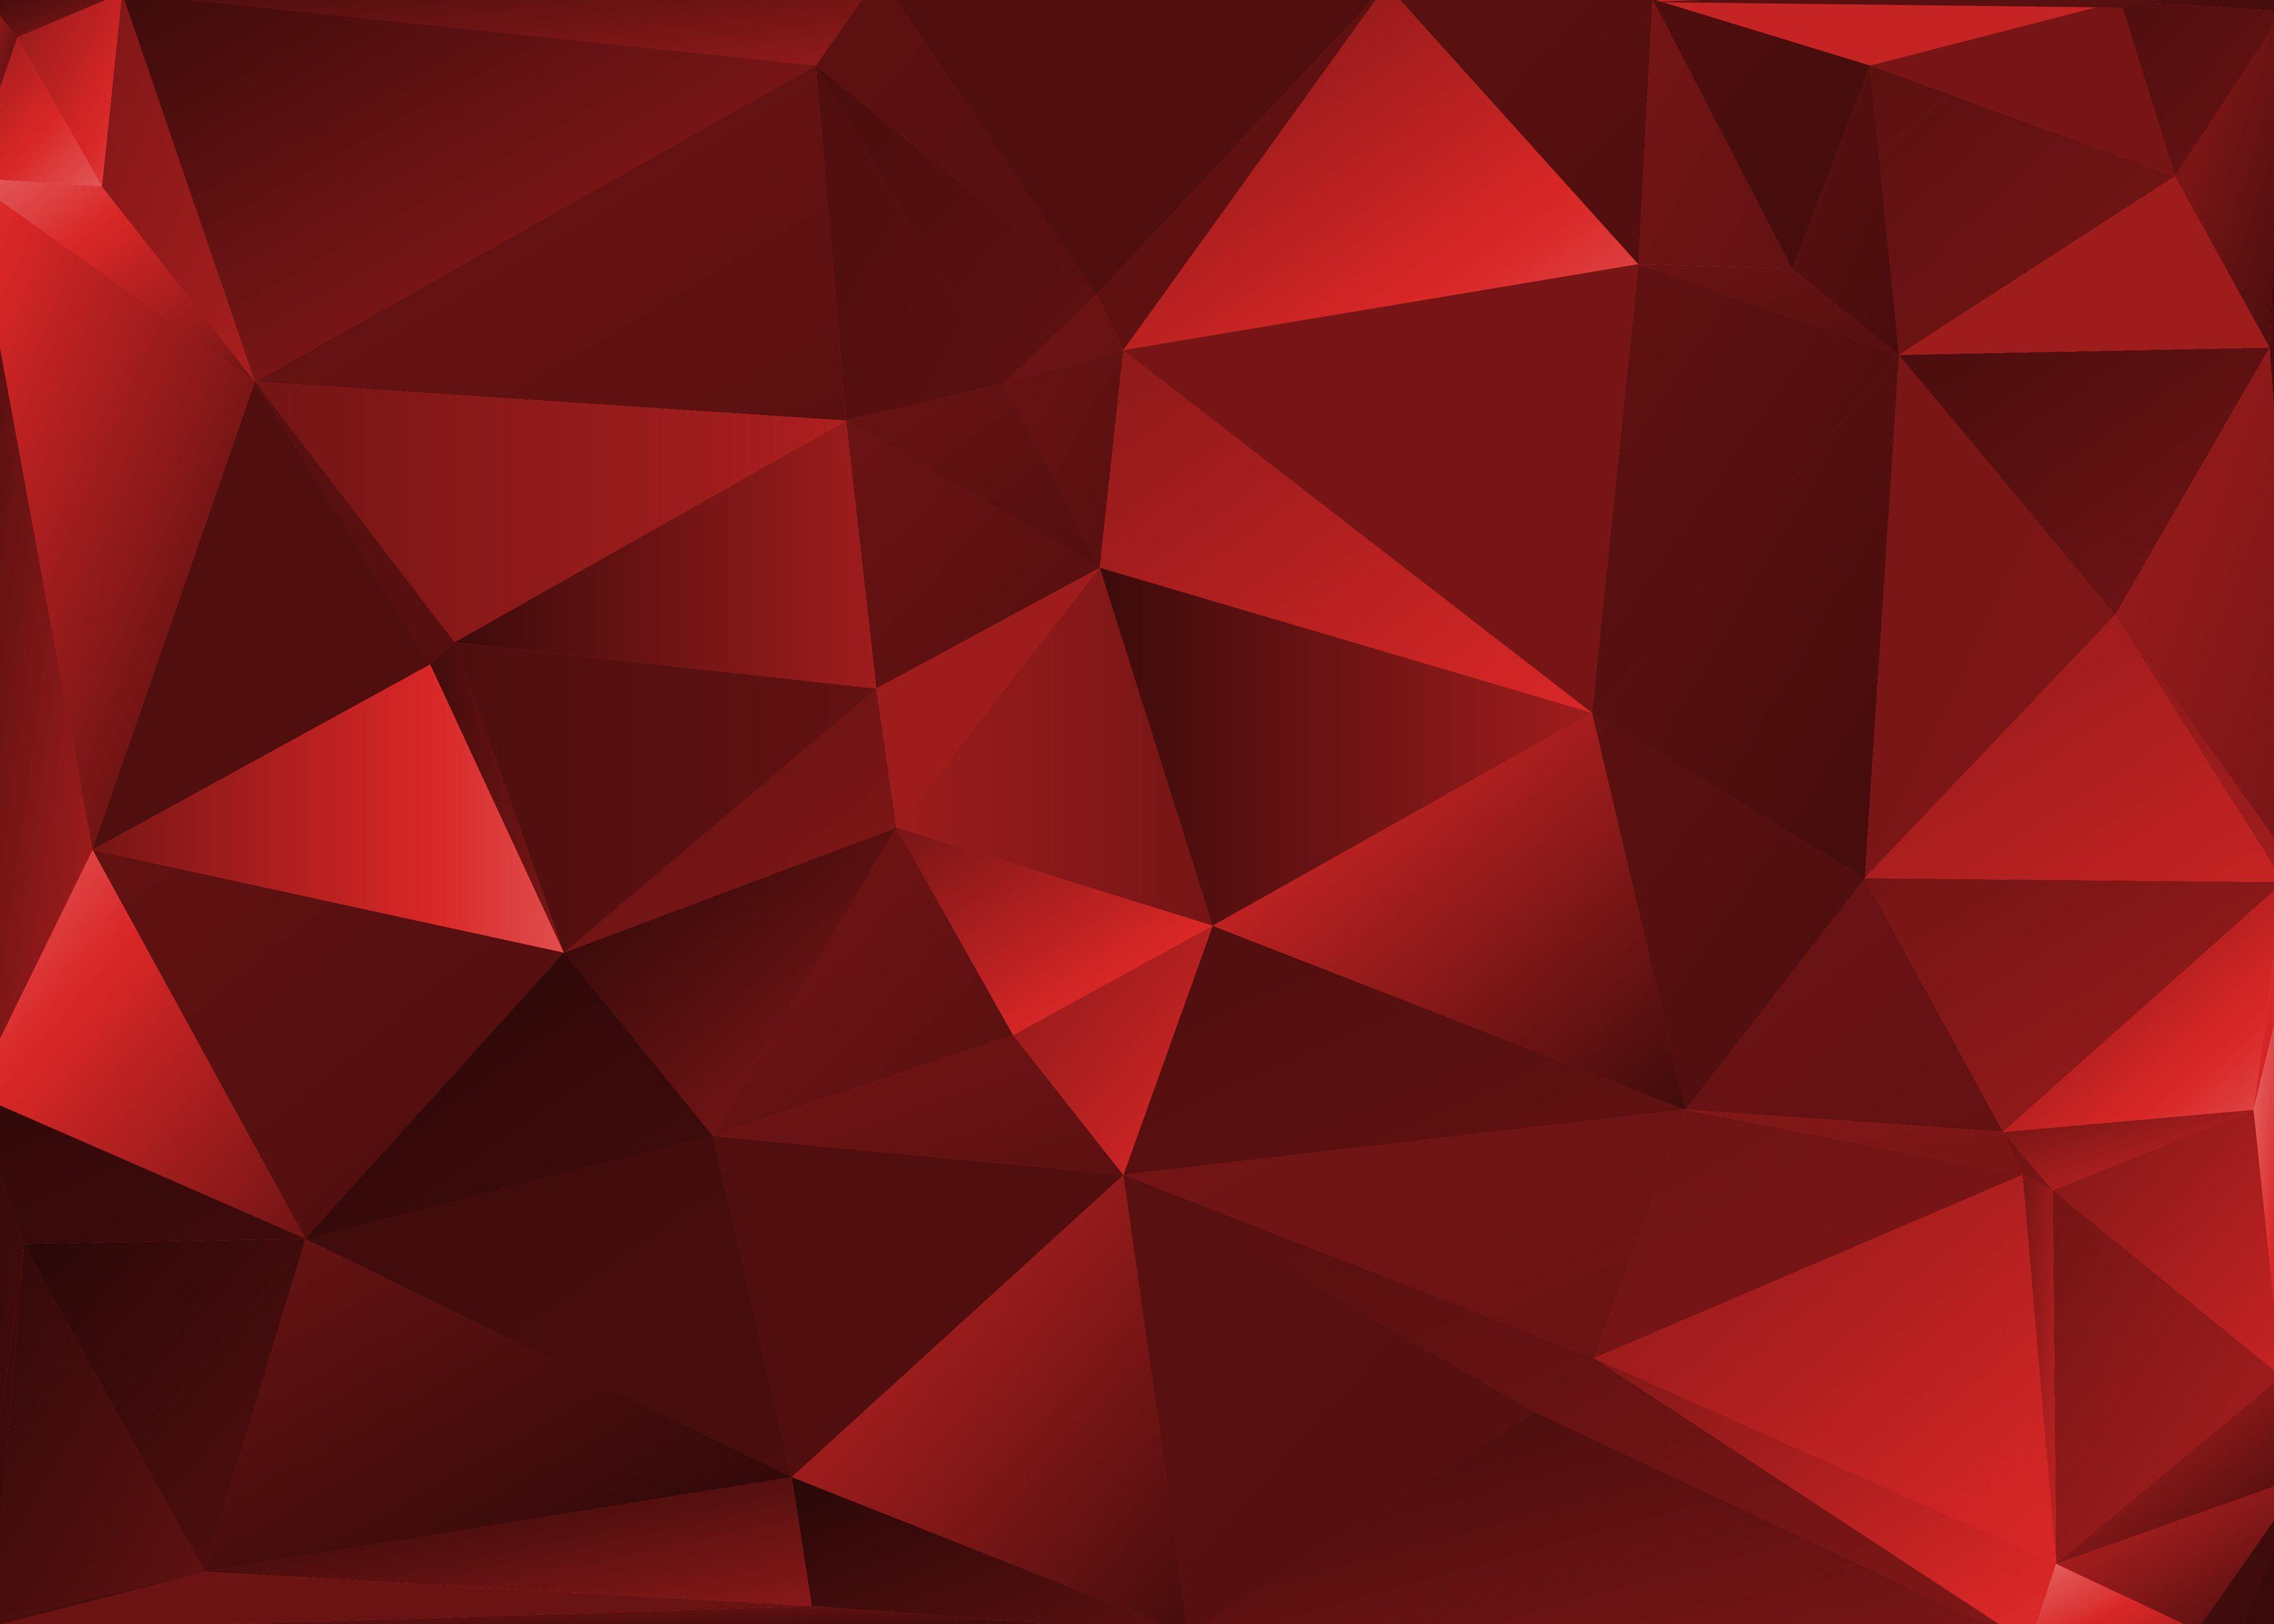 Http Www Texturezine Com Wp Content Uploads 2014 05 Red Polygon Jpg